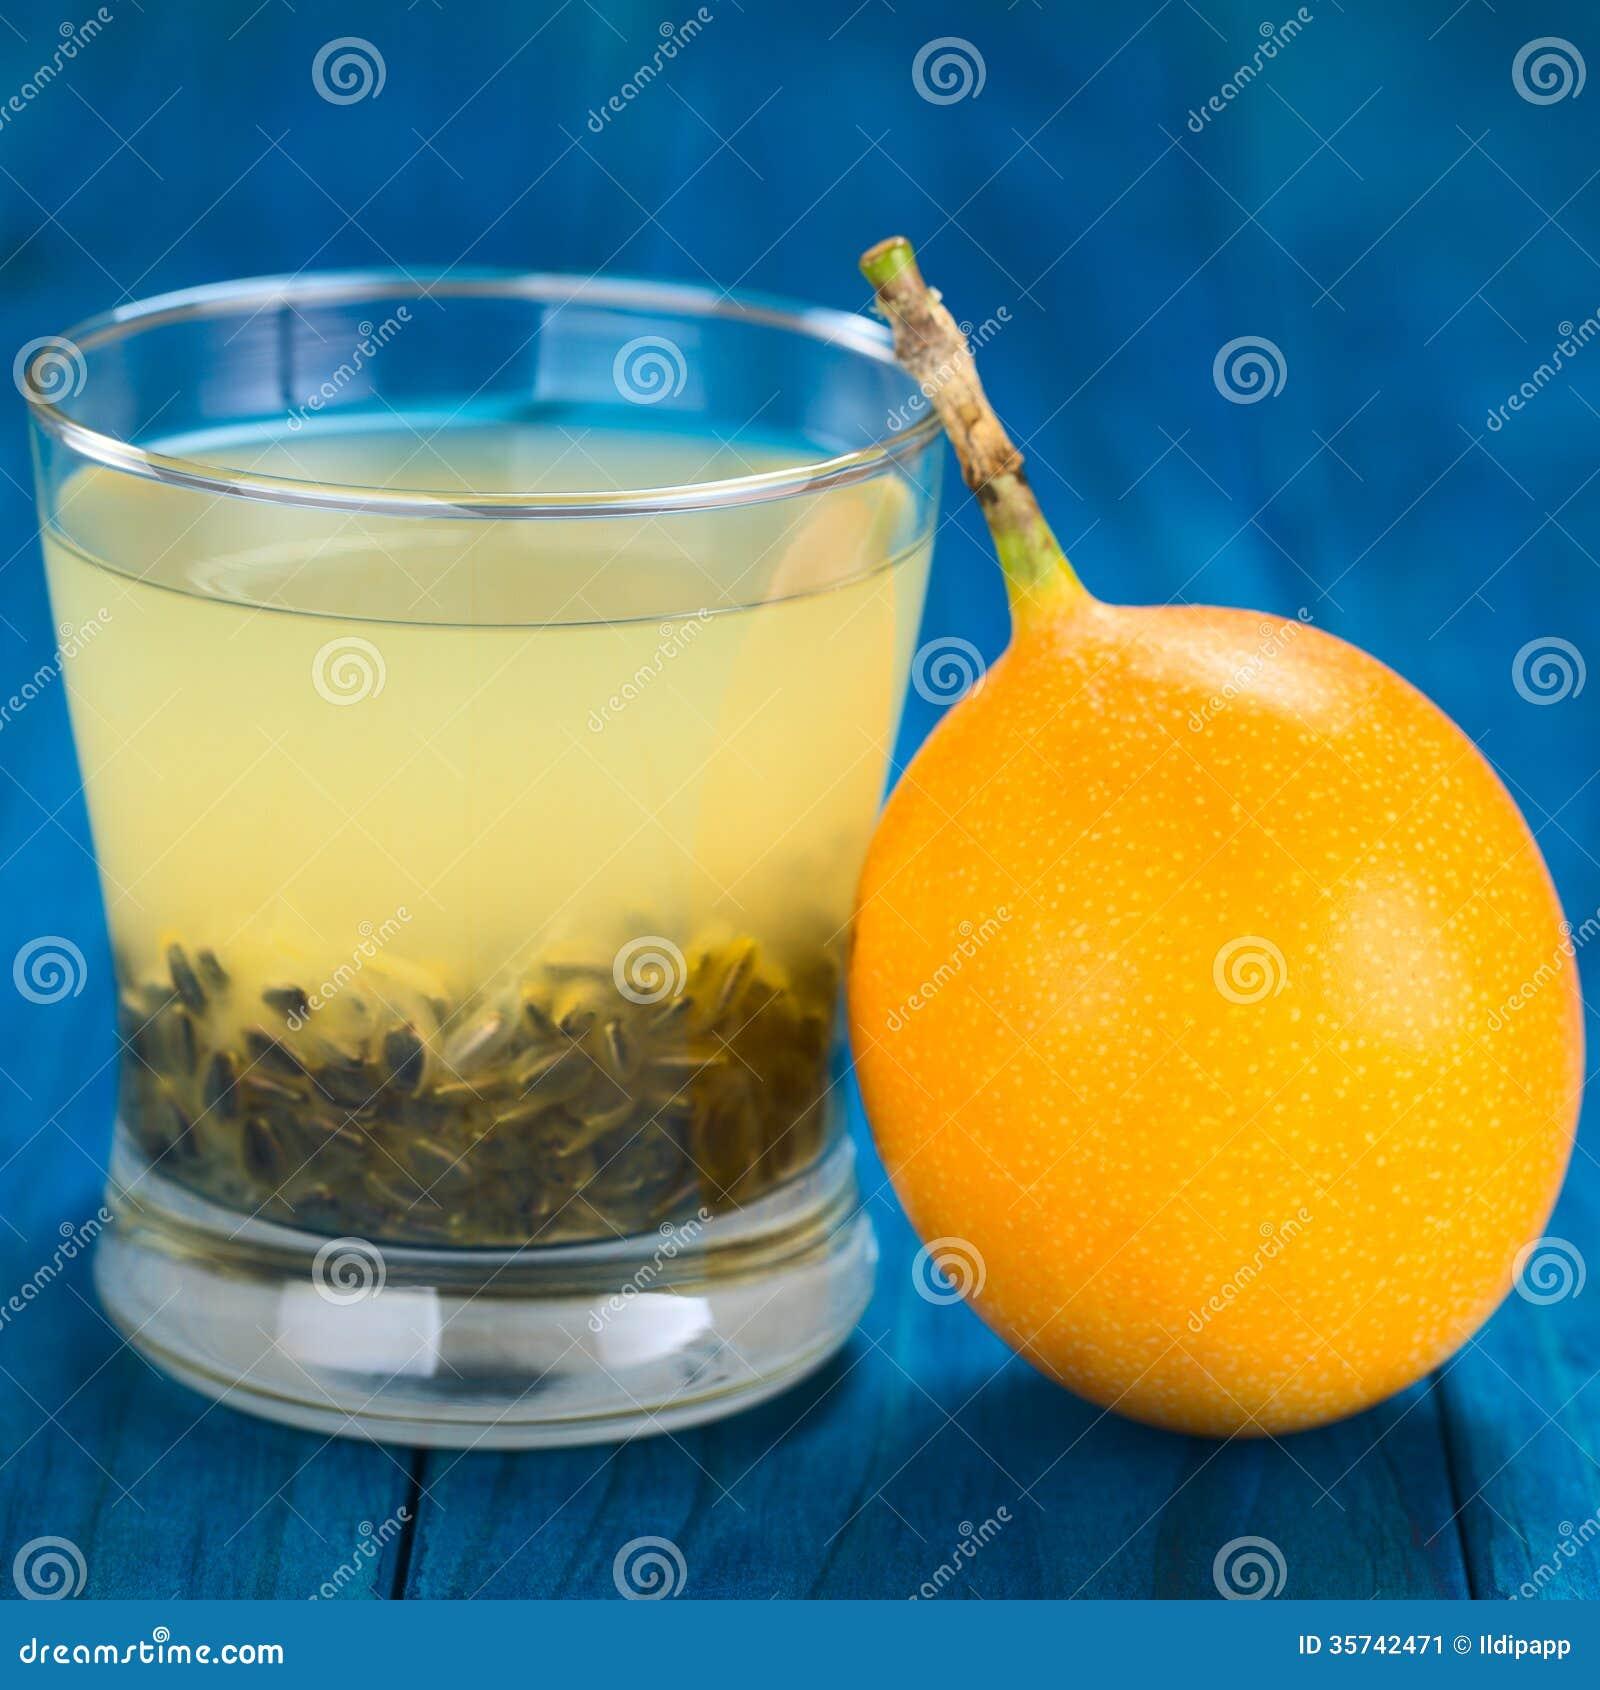 how to make granadilla juice